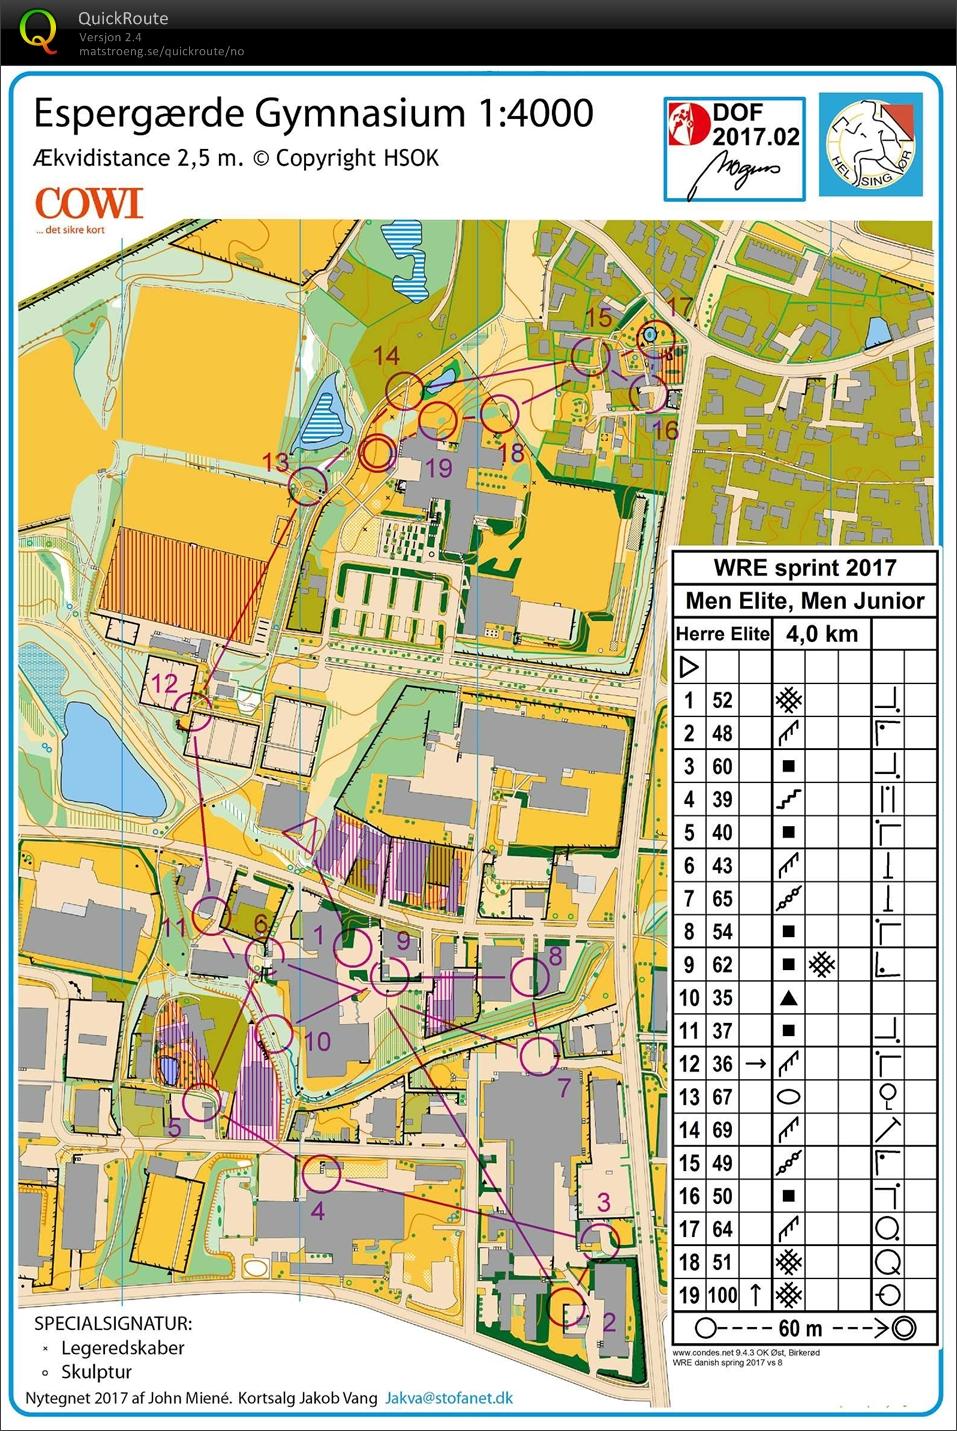 Danish Sprint March 24th 2017 Orienteering Map From Ulrik